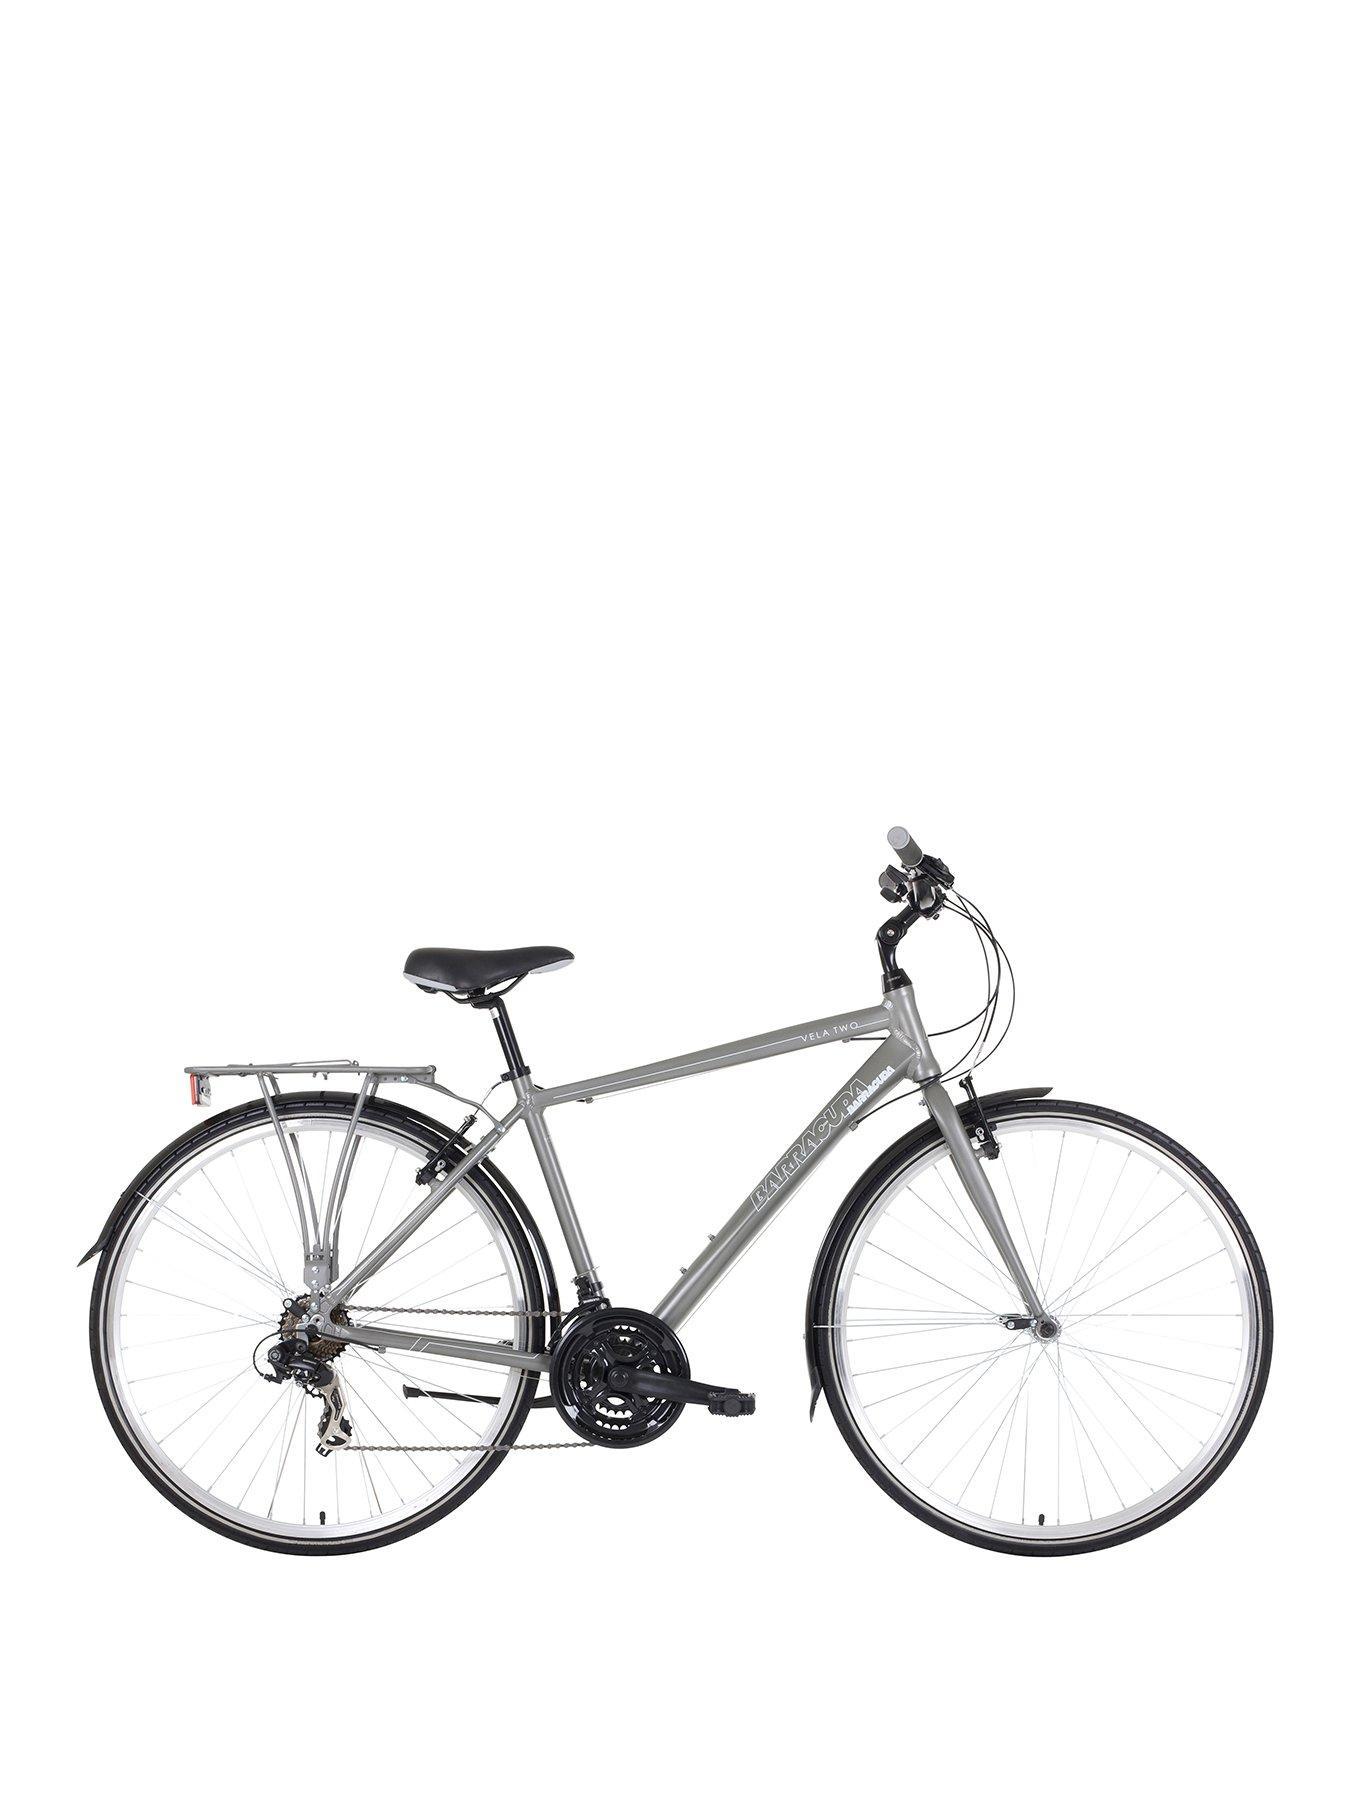 Red Venture 2 Step Thru Comfort Bike 17//MD Frame